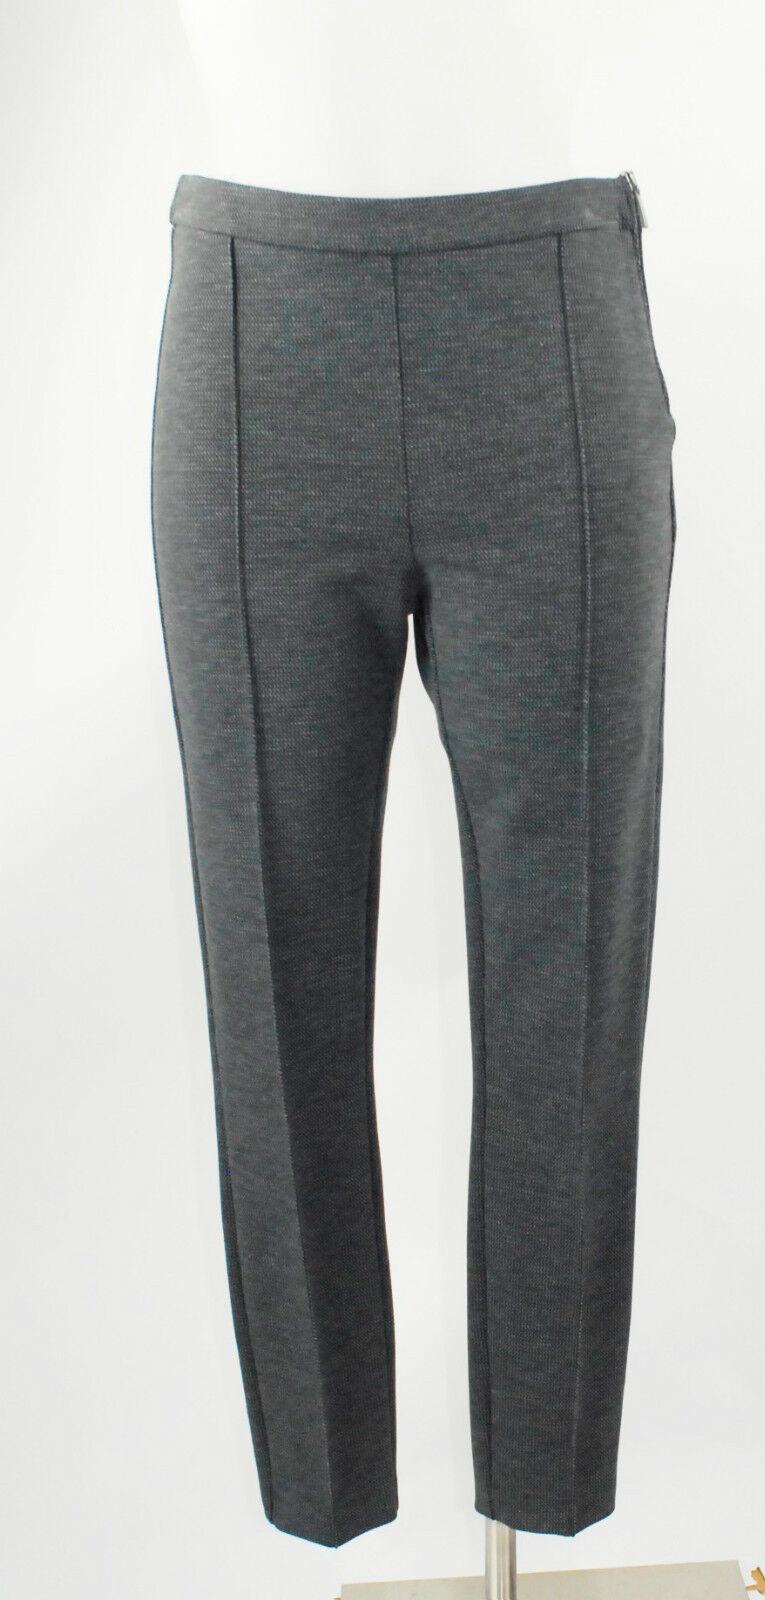 Apriori 7 8 Hose 38 grey black Viskose neu mit Etikett trousers pantalon